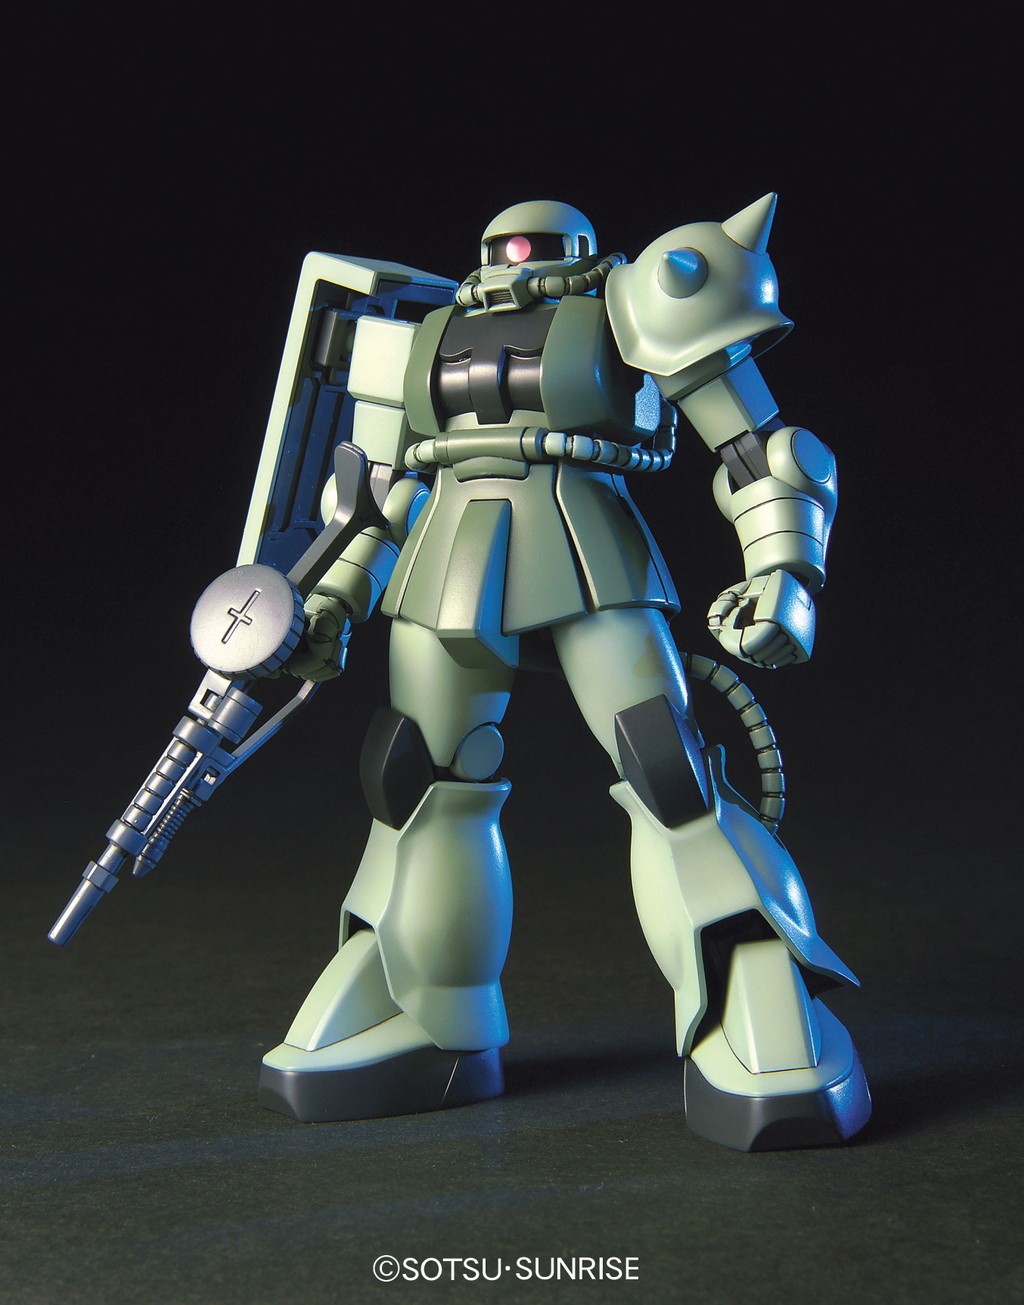 HGUC 1/144 MS-06 量産型ザク [Zaku II]( ザクⅡ) 0122240 5057392 4573102573926